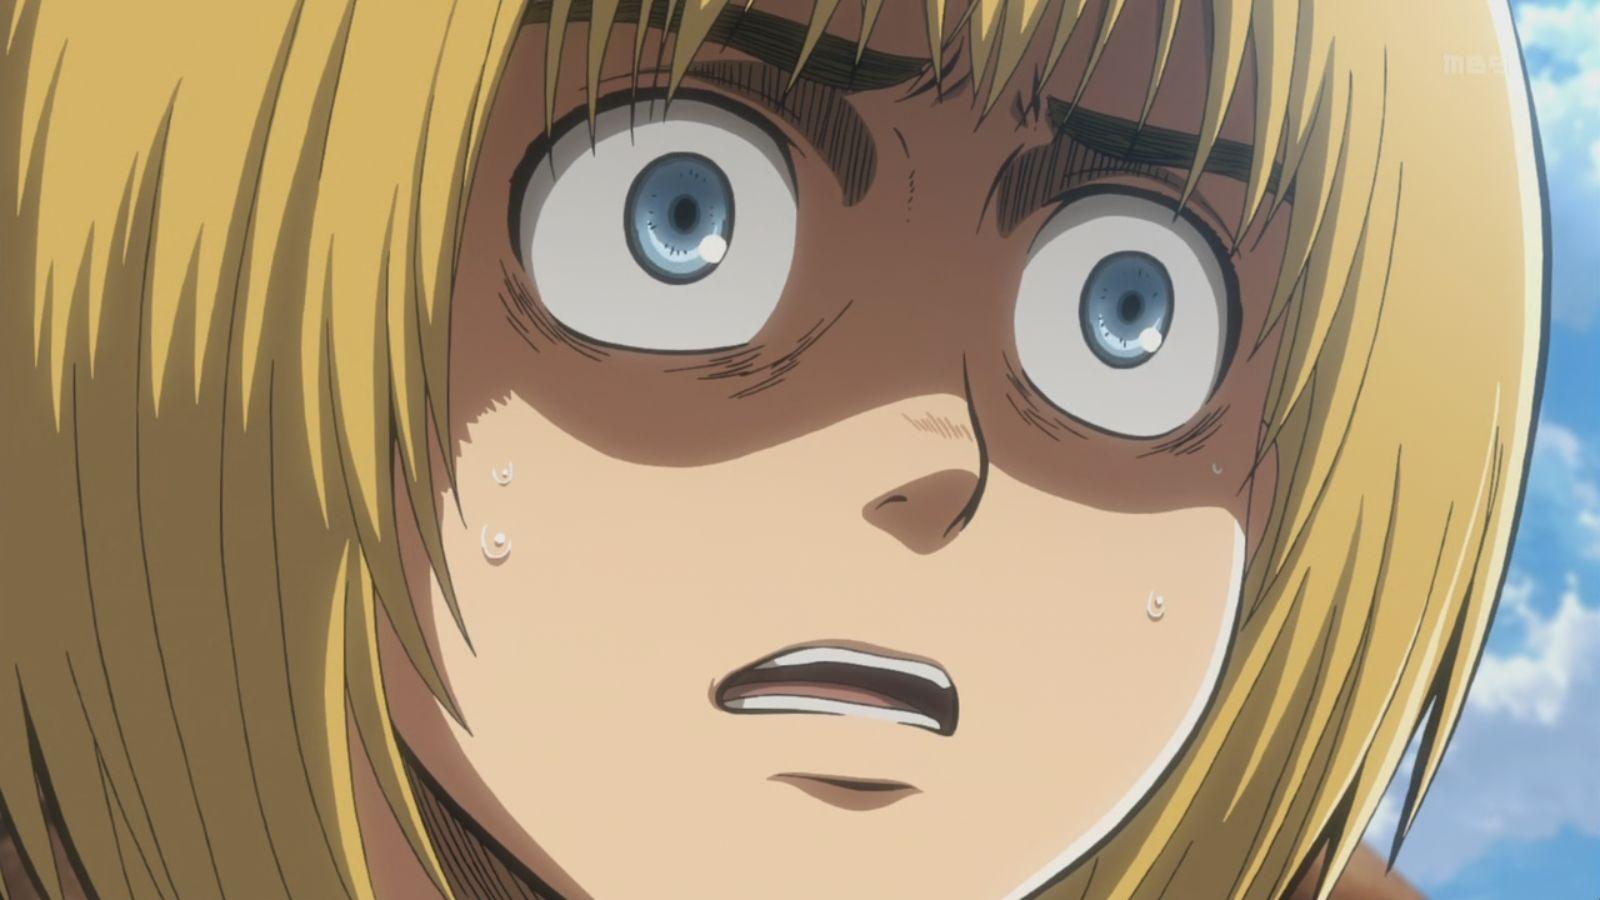 Shingeki-no-Kyojin_Haruhichan.com-Armin-Is-A-Girl-2